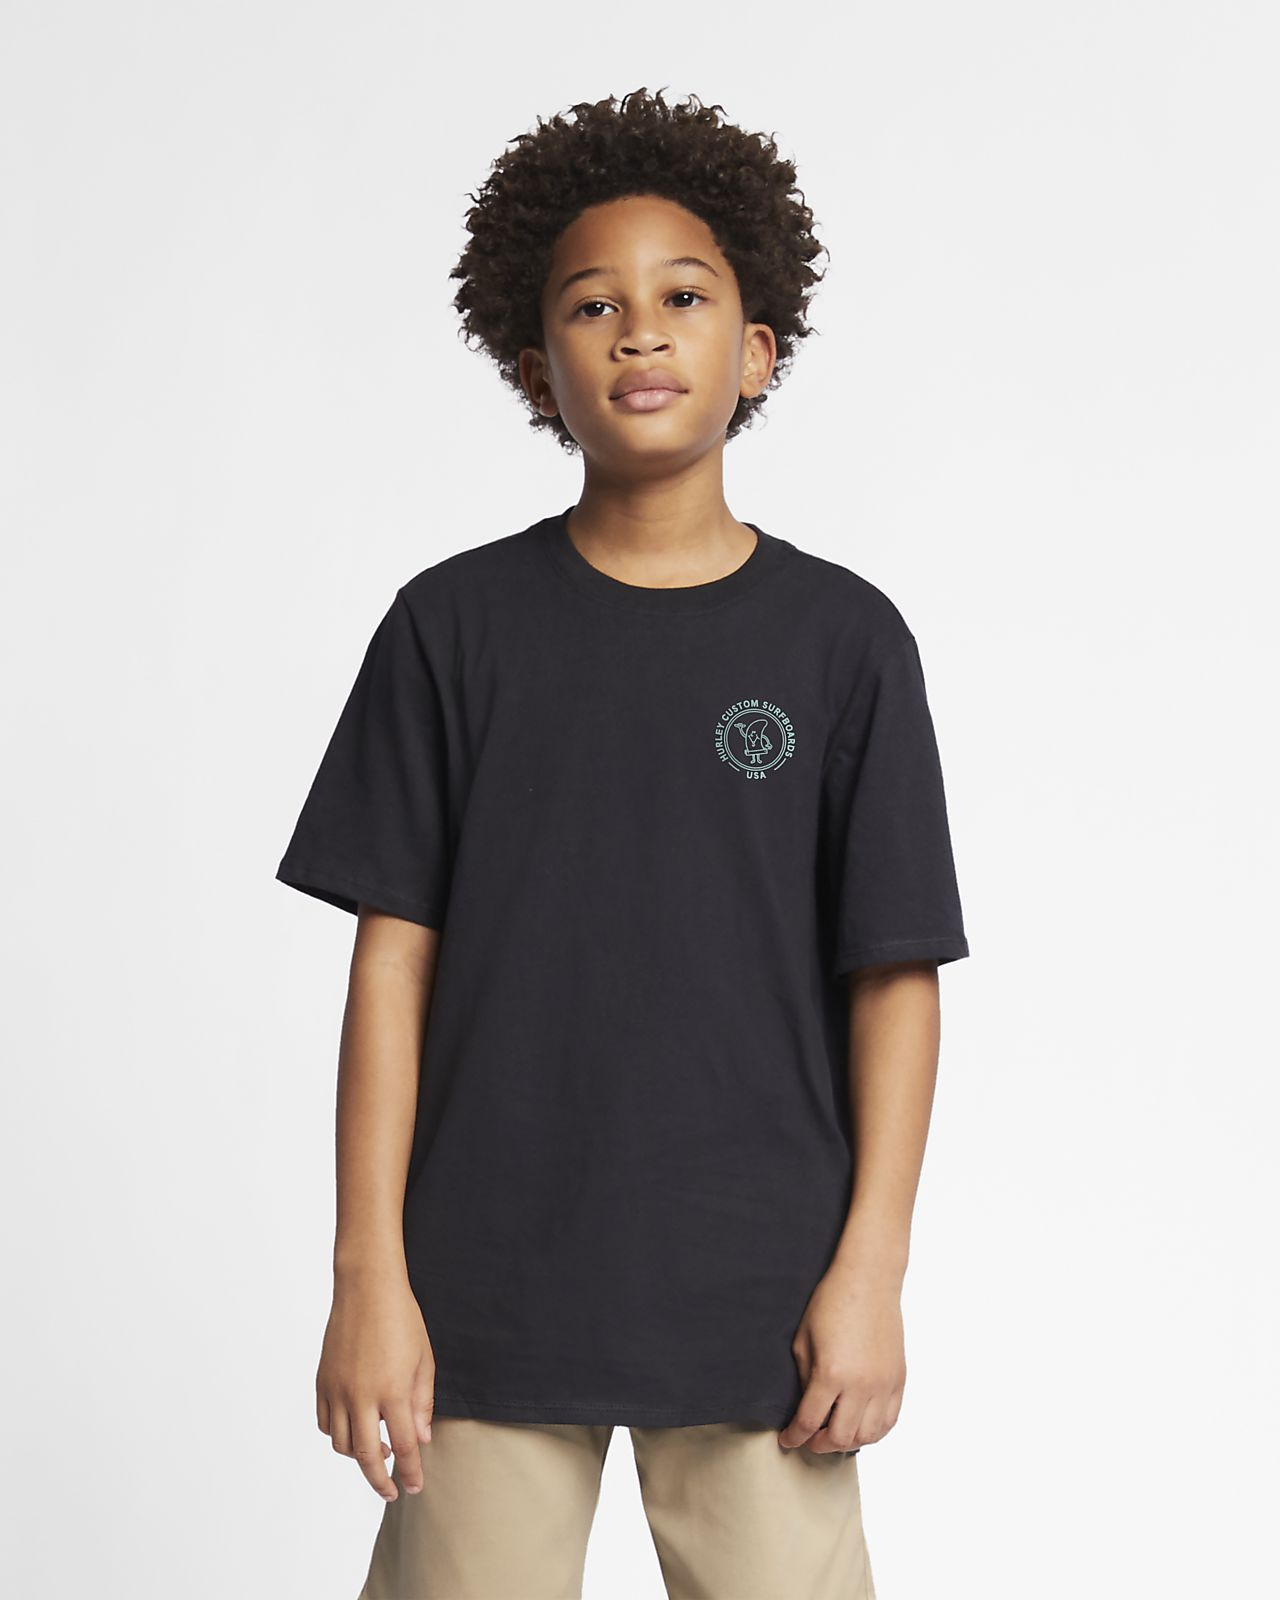 T-shirt Hurley Premium Finjamin - Bambino/Ragazzo